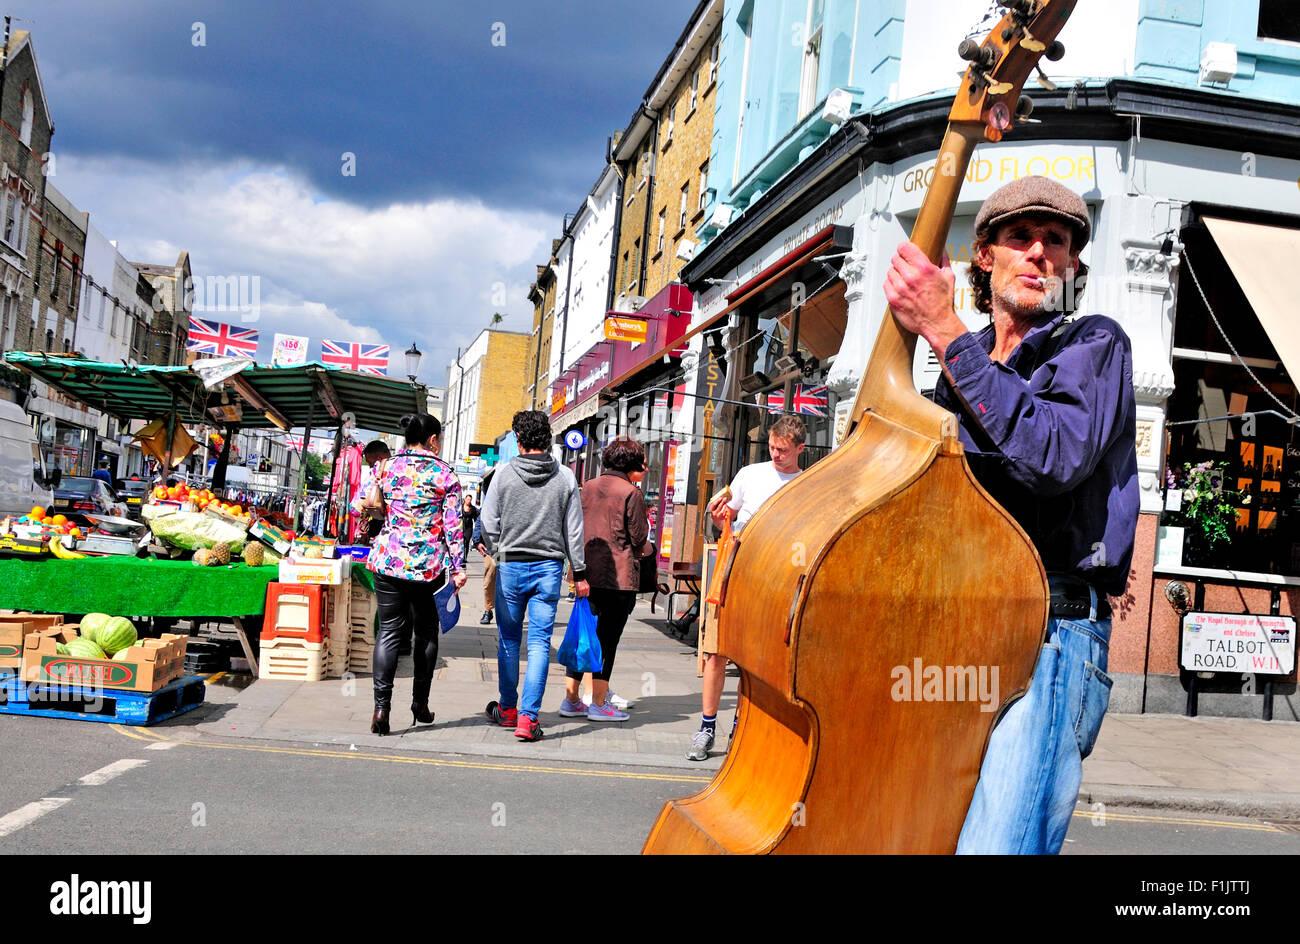 london-england-uk-portobello-road-busker-playing-the-double-bass-F1JTTJ.jpg